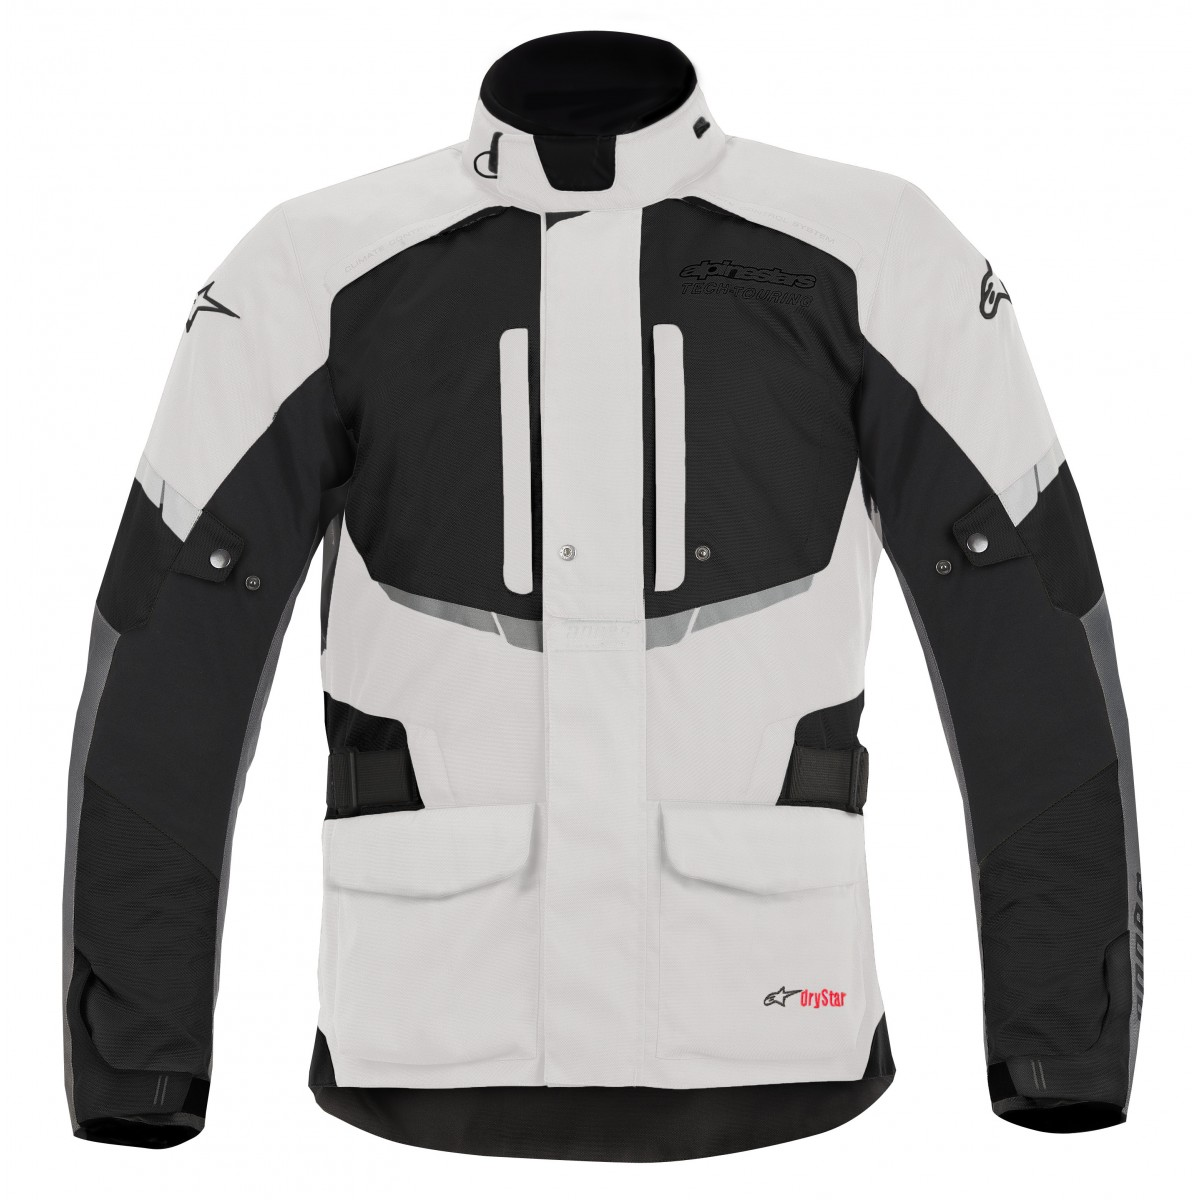 0 Jaqueta Alpinestars Andes Drystar® WP Cinza Claro (Só XL/2XL/3XL ) para Big Trail  - Super Bike - Loja Oficial Alpinestars